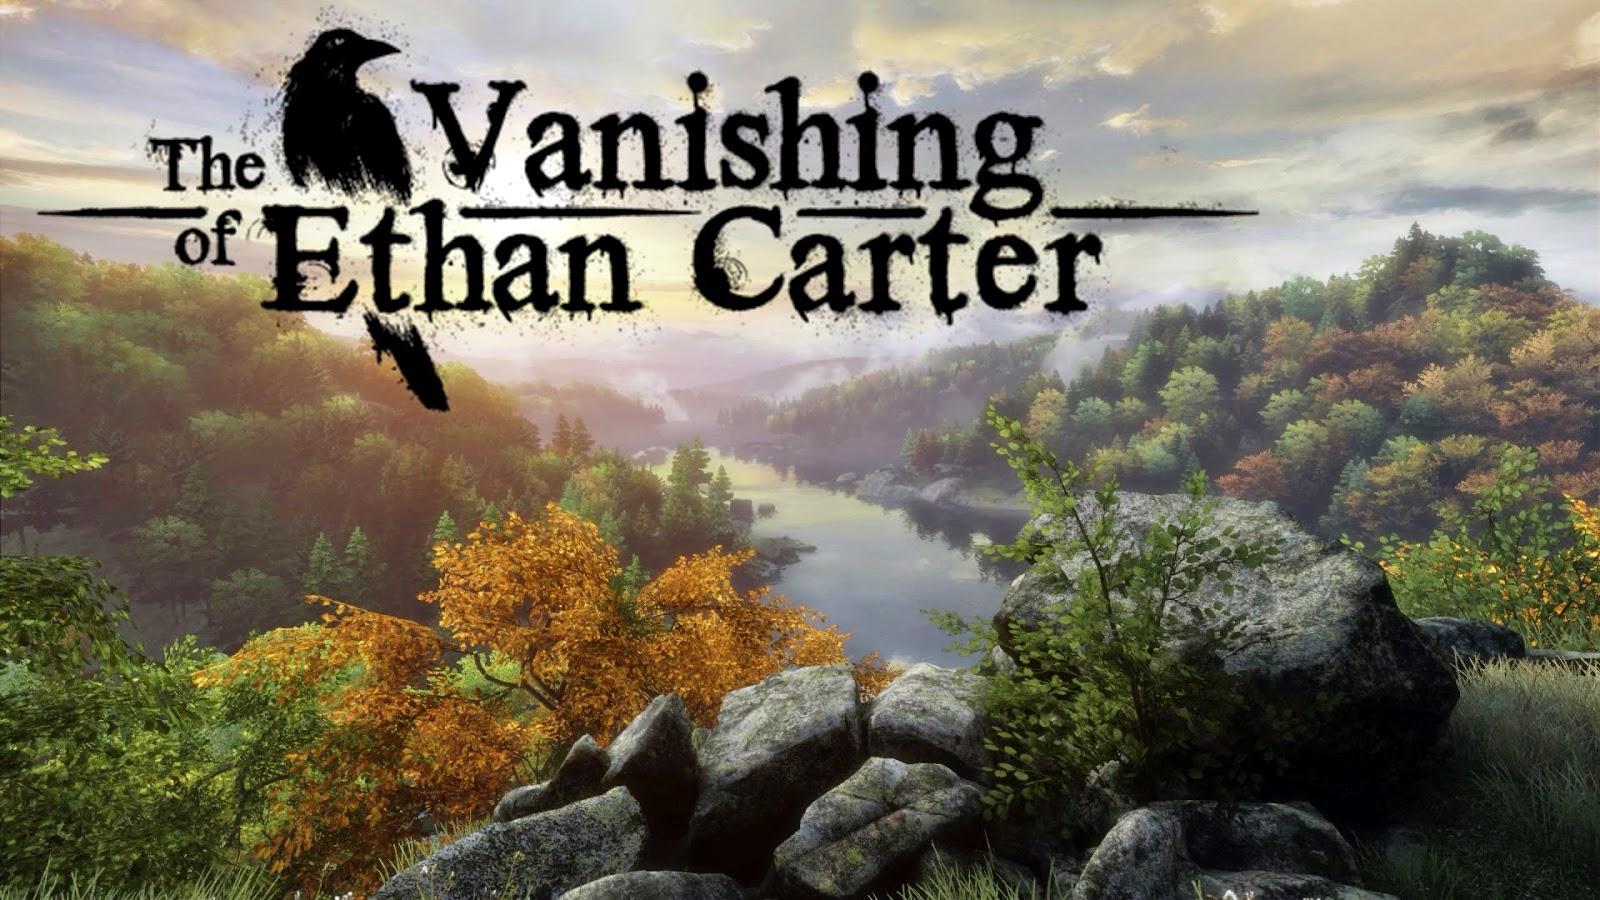 Programa 8x07 (07-11-2014) The Vanishing of Ethan Carter Maxresdefault-2